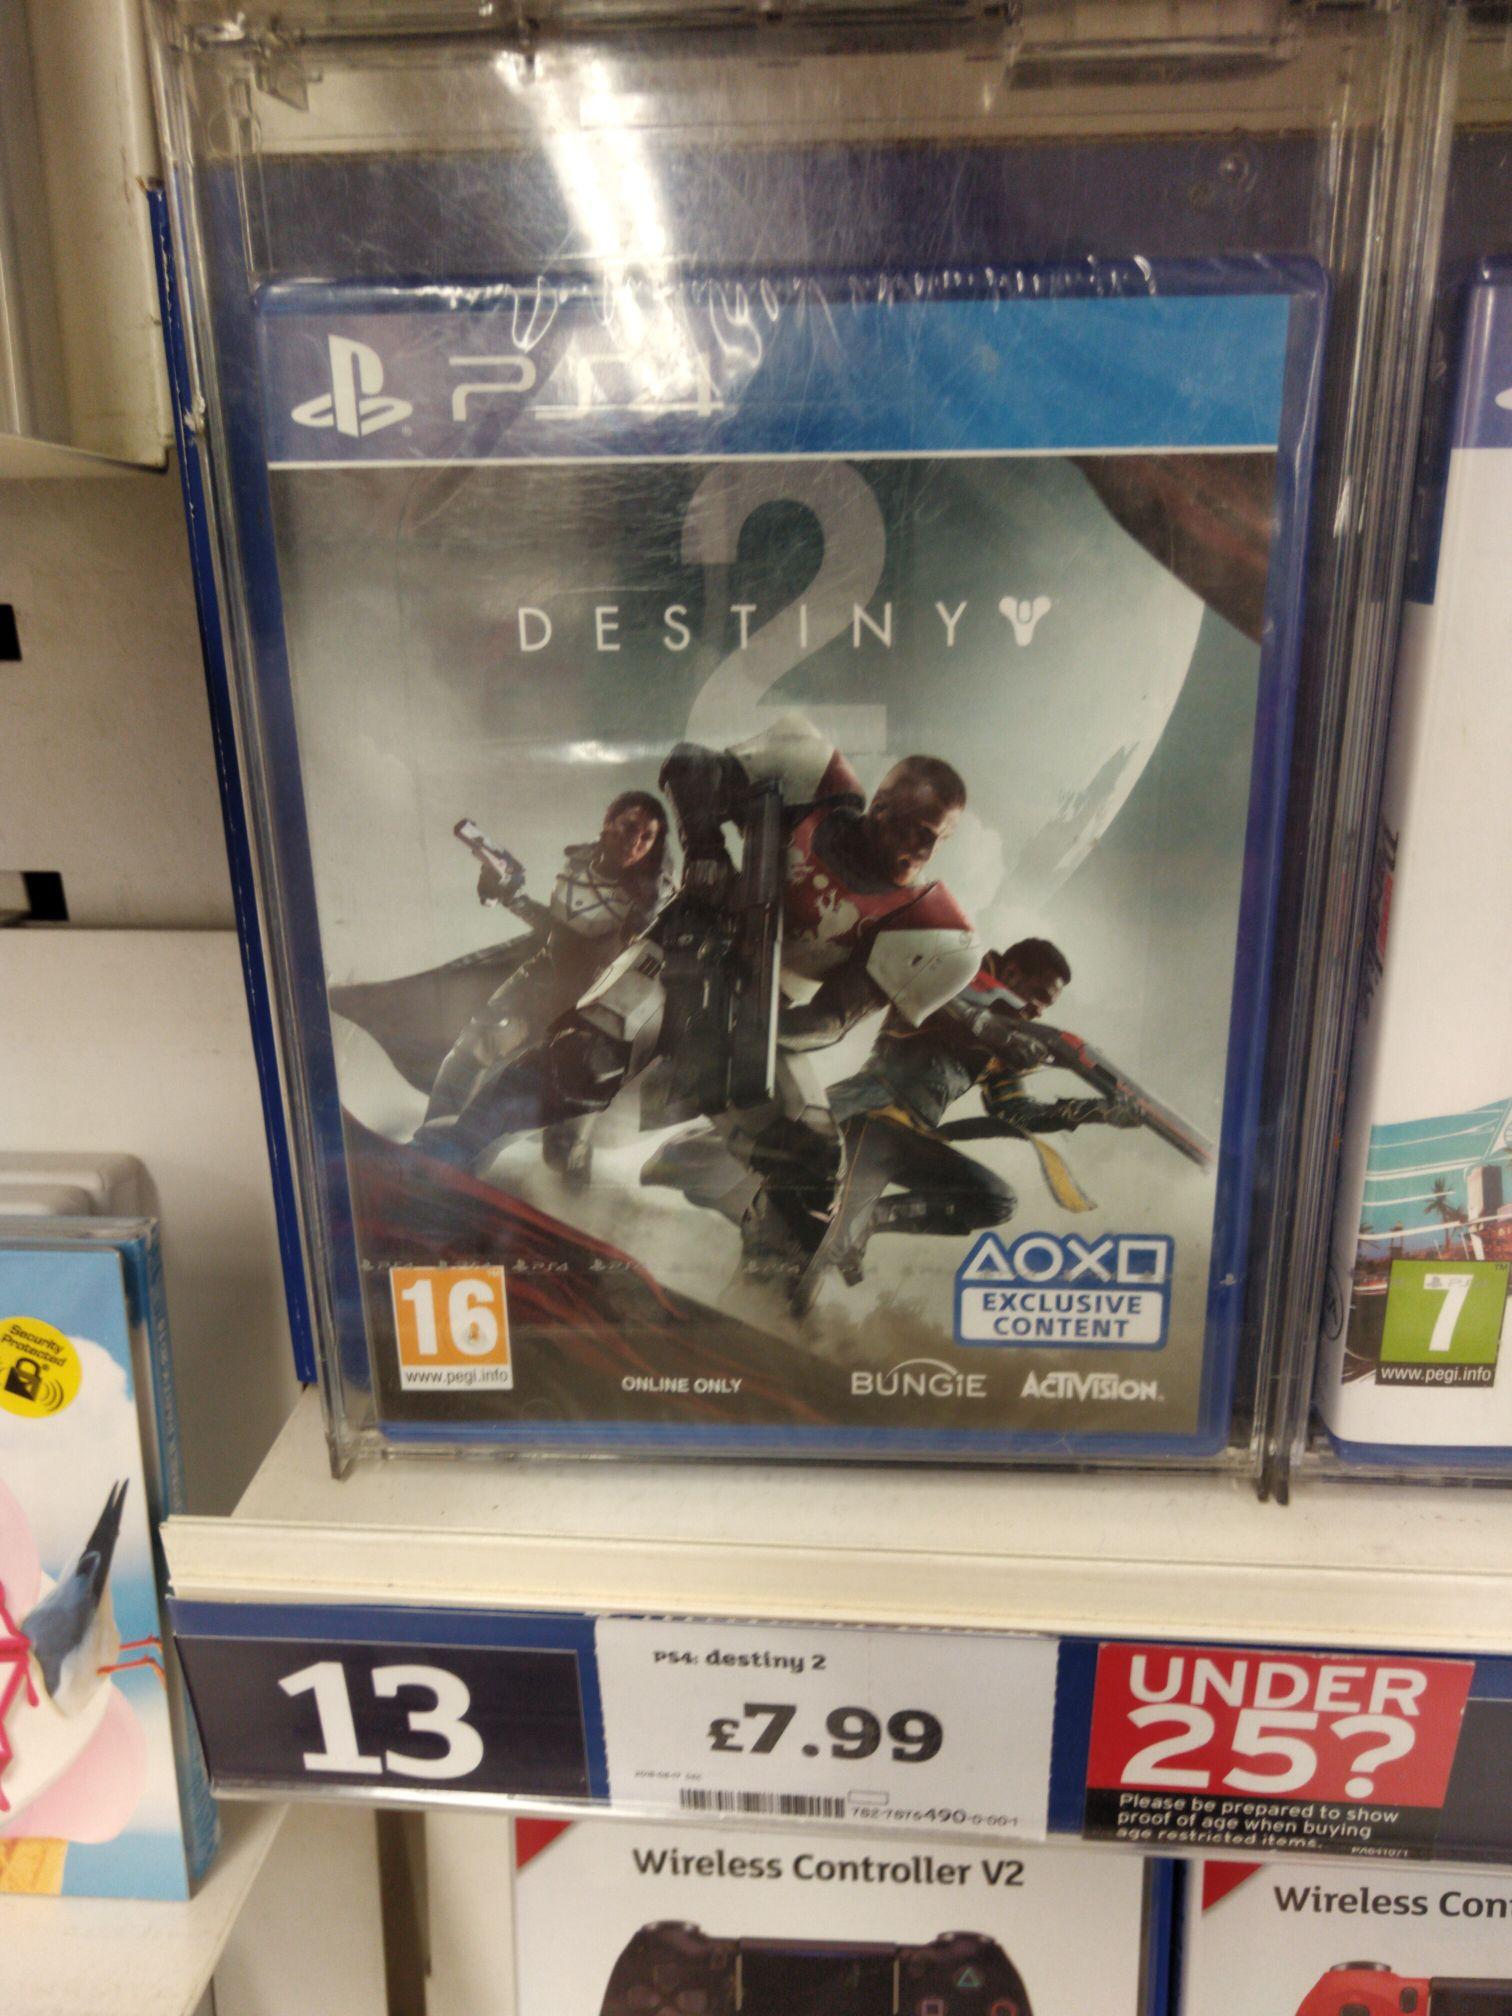 Destiny 2 - Sainsbury's in-store (PS4 / XBOX) - £7.99